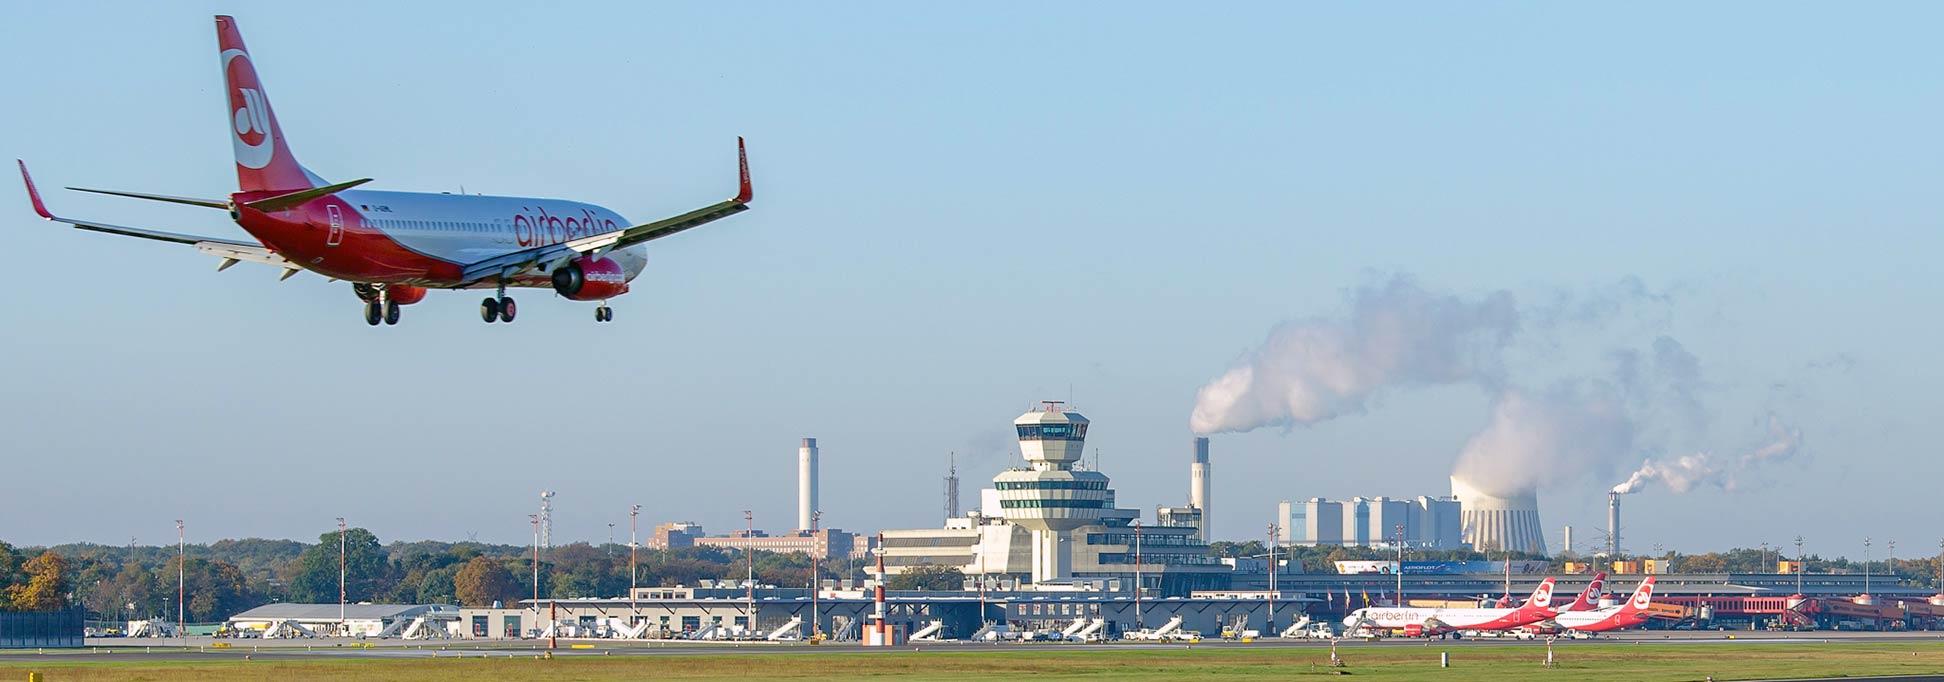 Airports around the World - IATA code: T - Nations Online